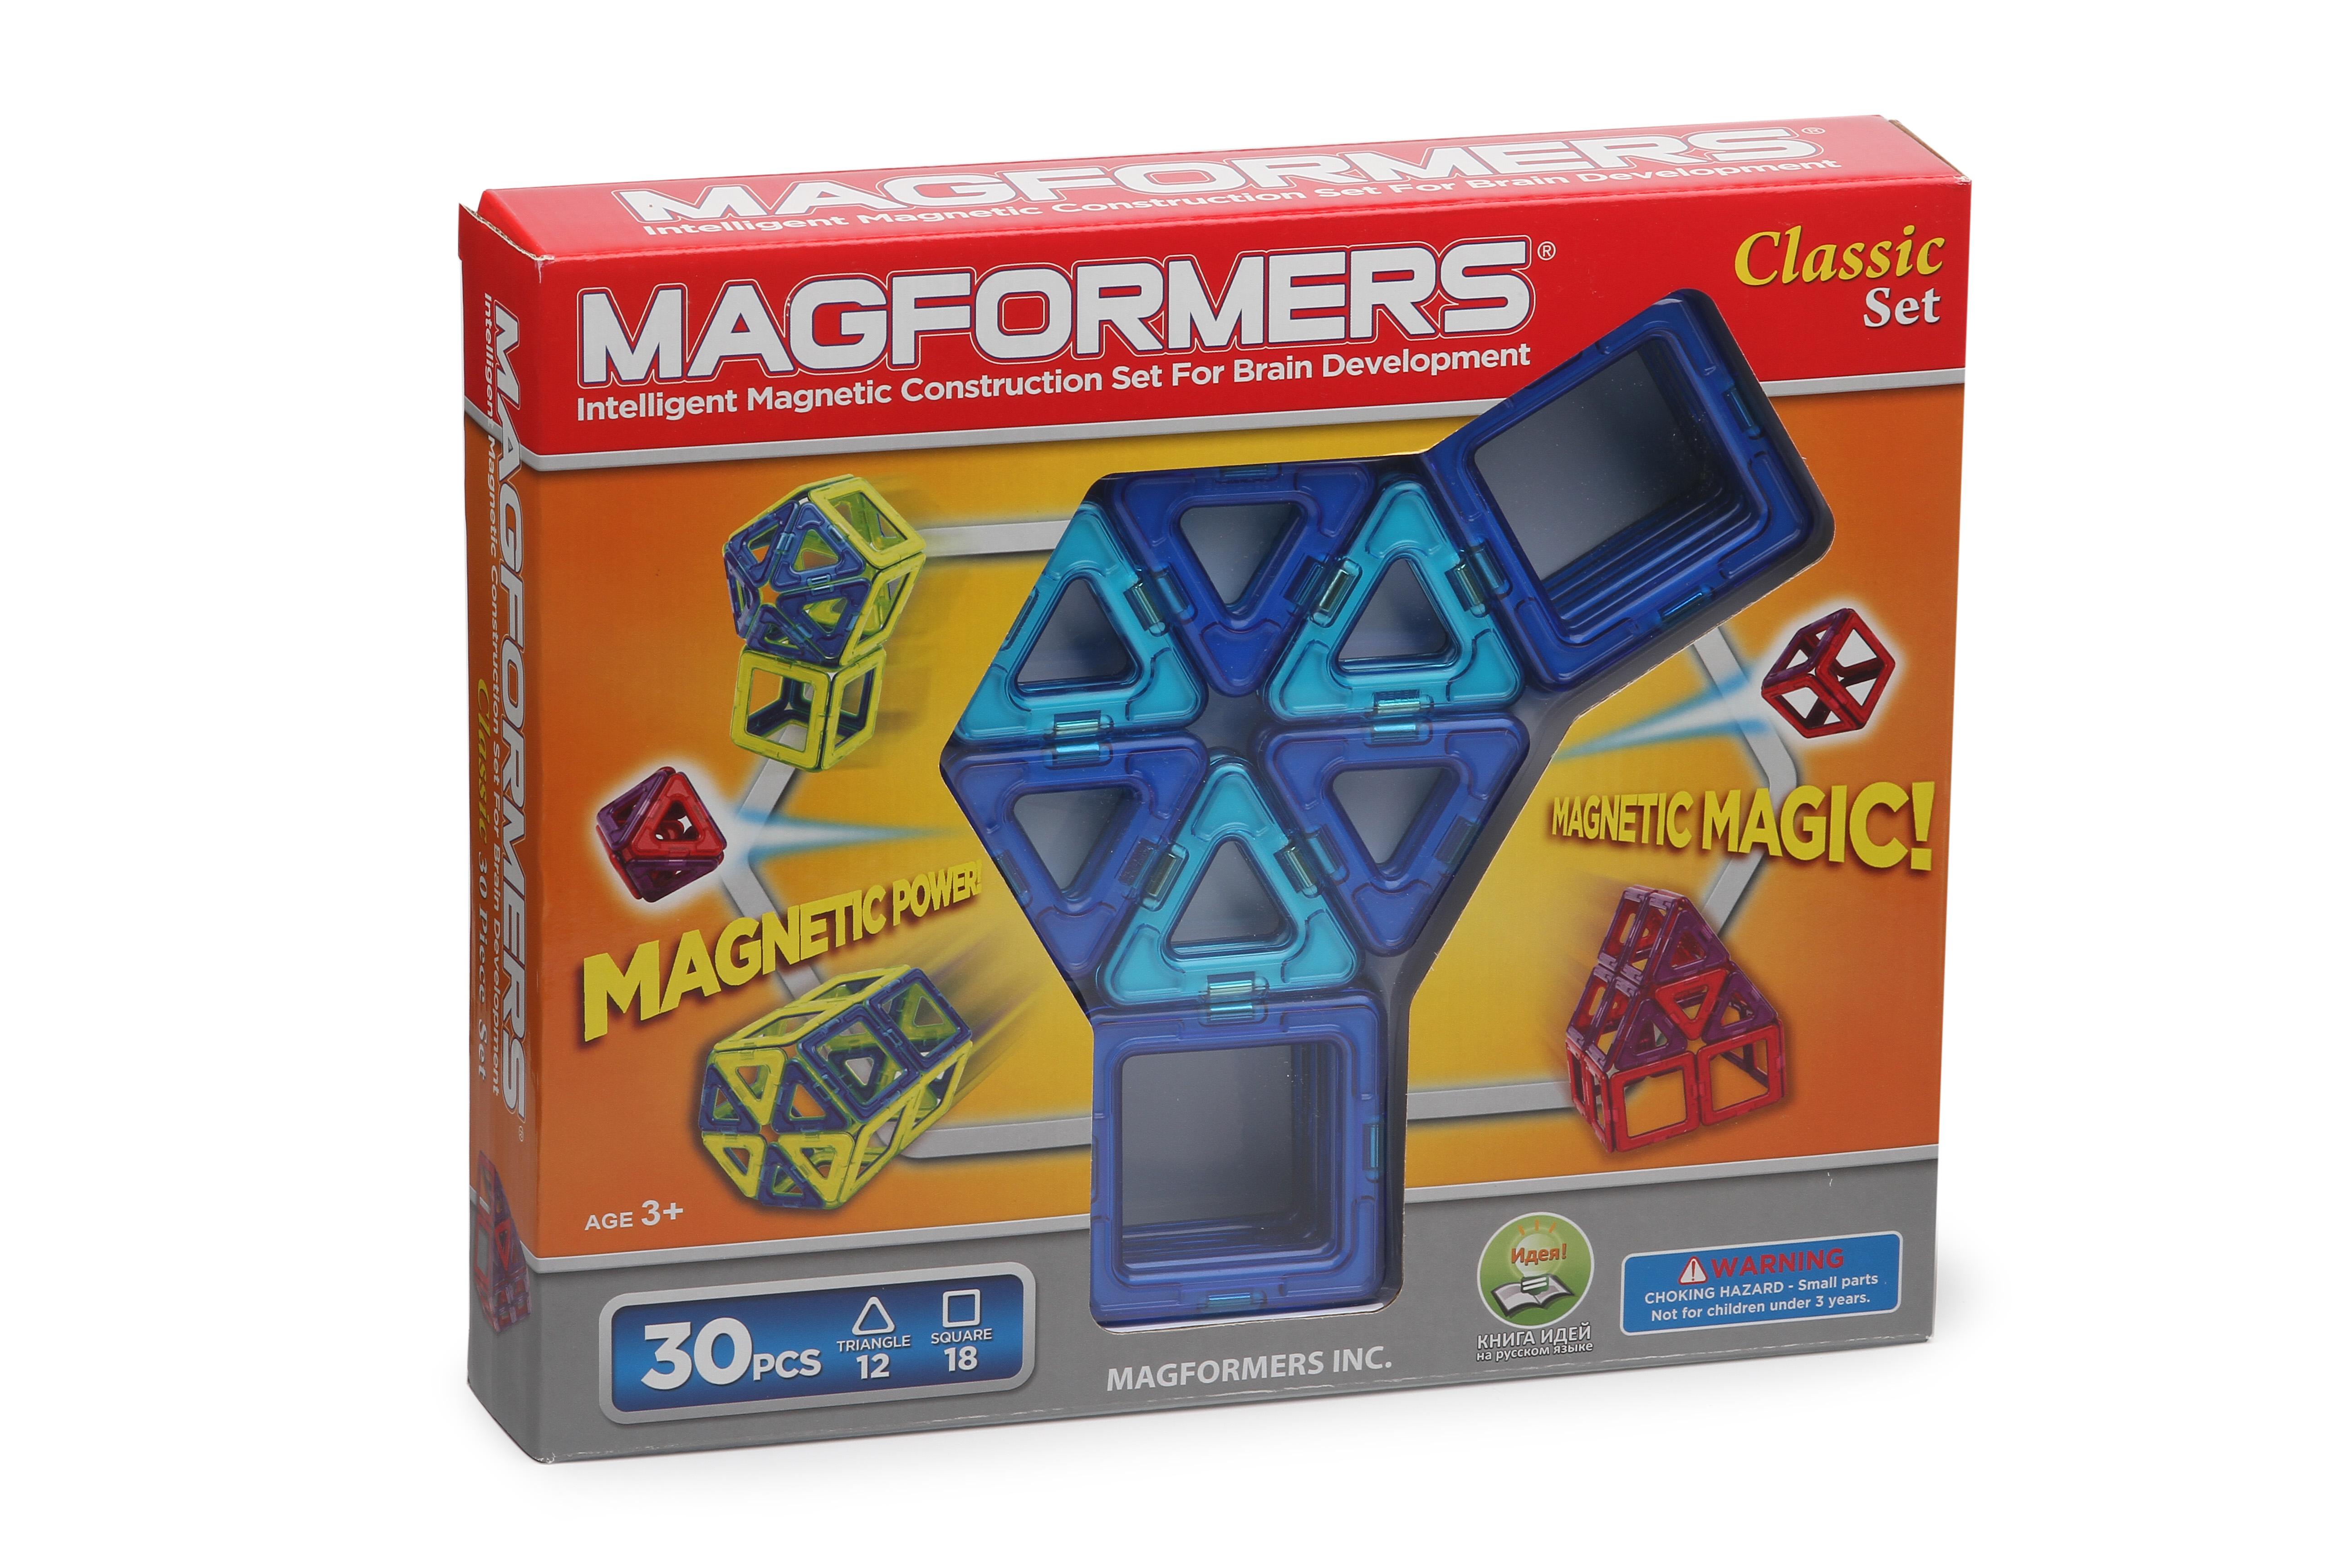 ����������� Magformers Classic set 30 ���������